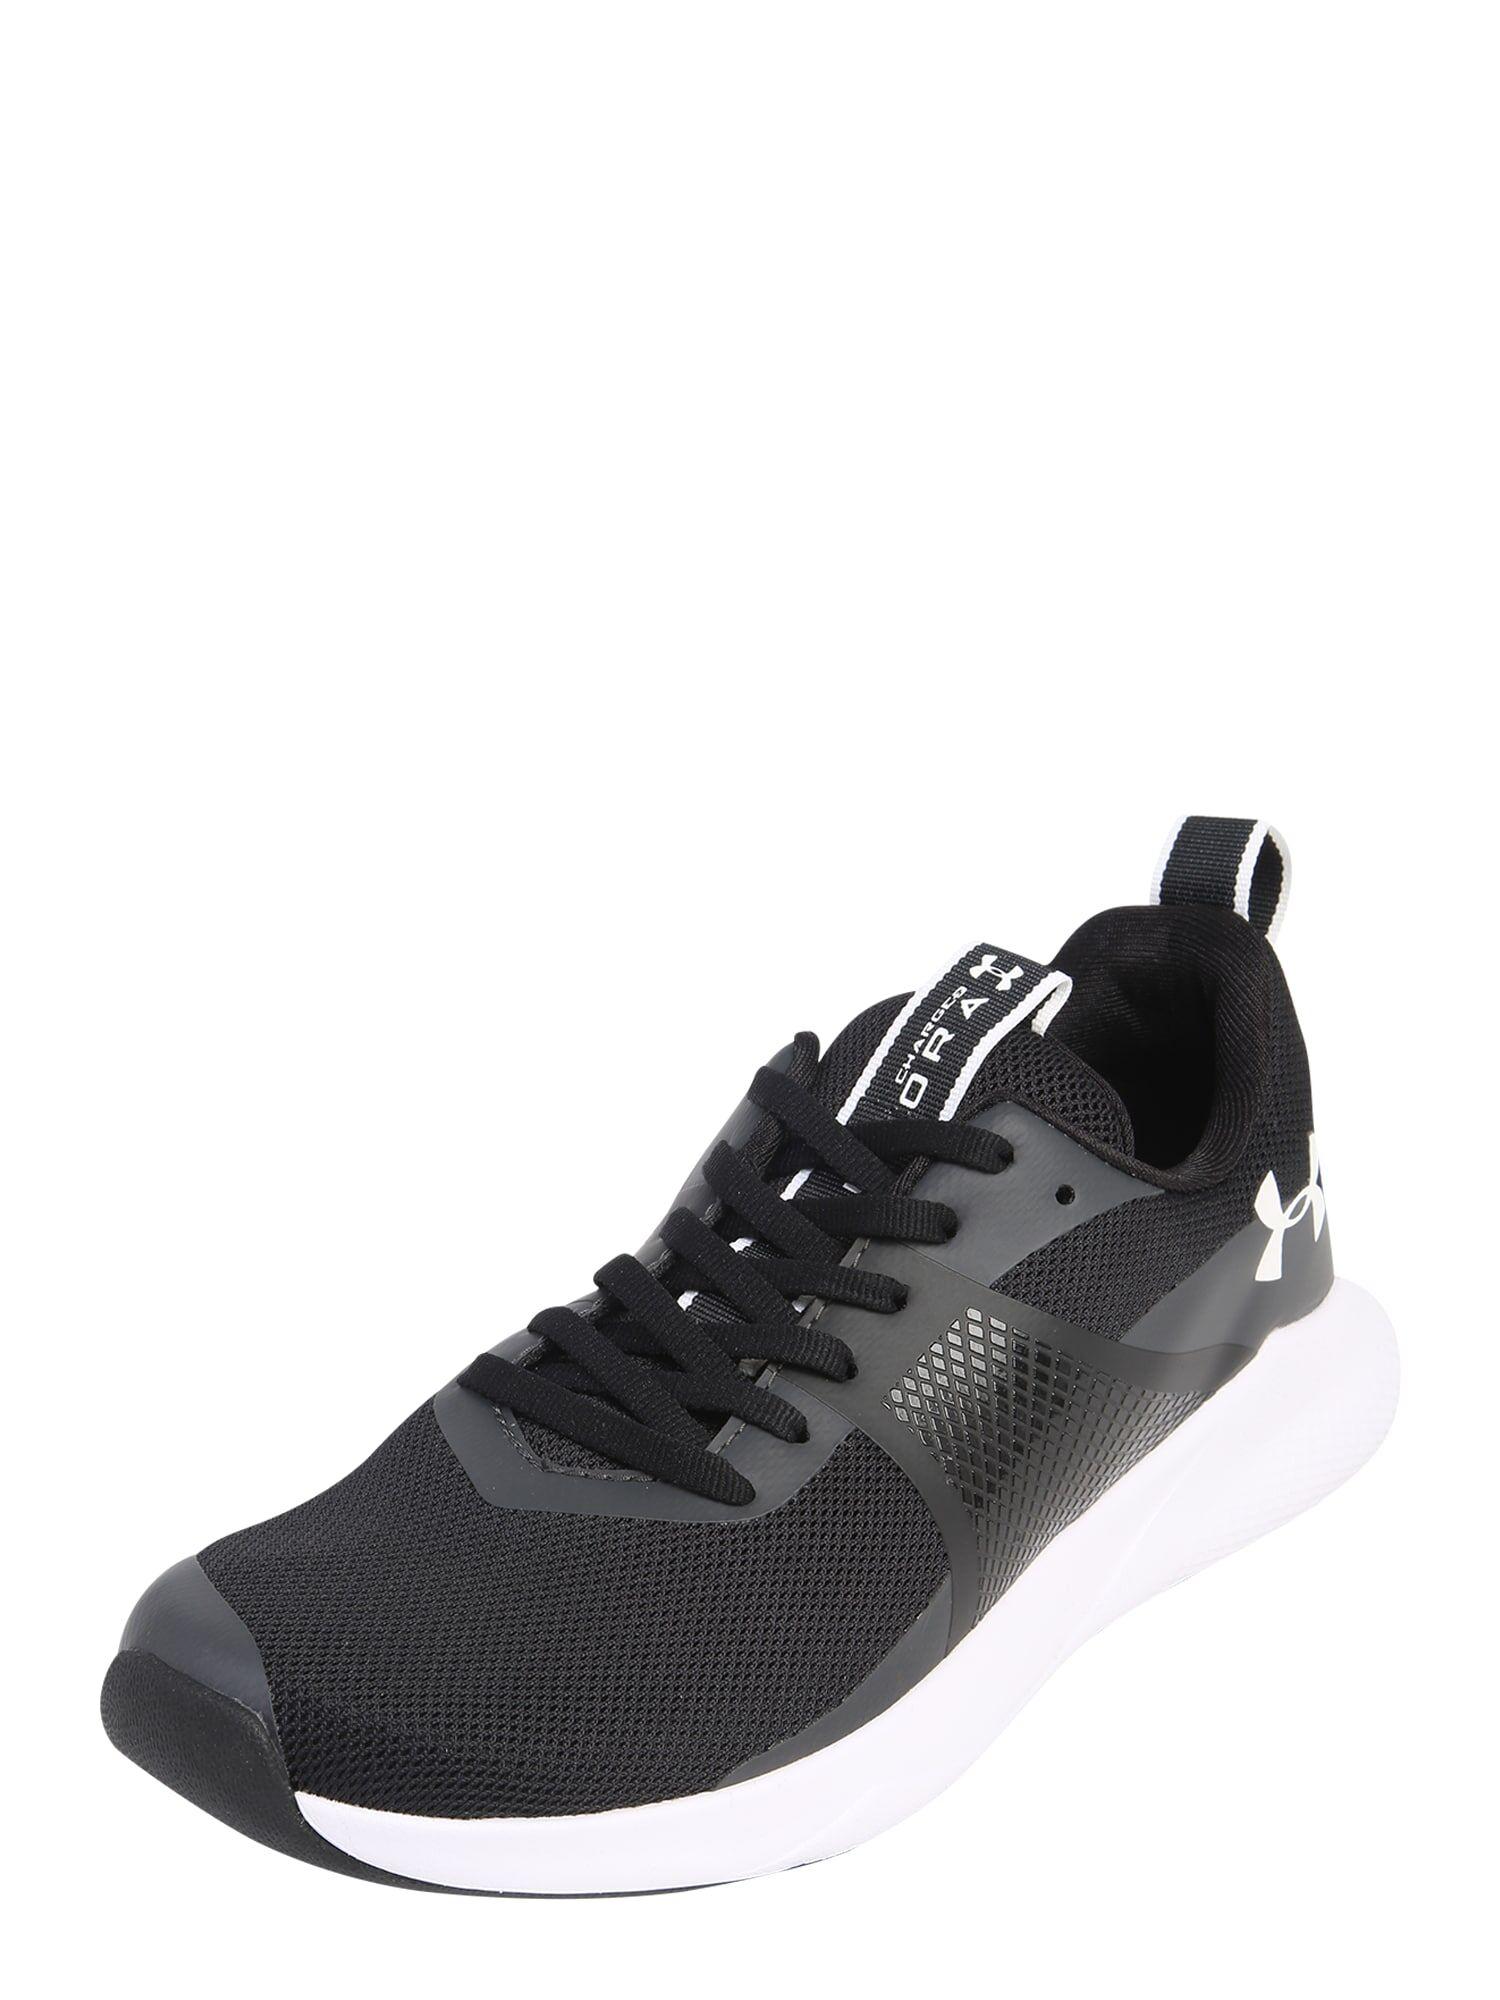 UNDER ARMOUR Chaussure de sport 'Aurora'  - Noir - Taille: 5.5 - female